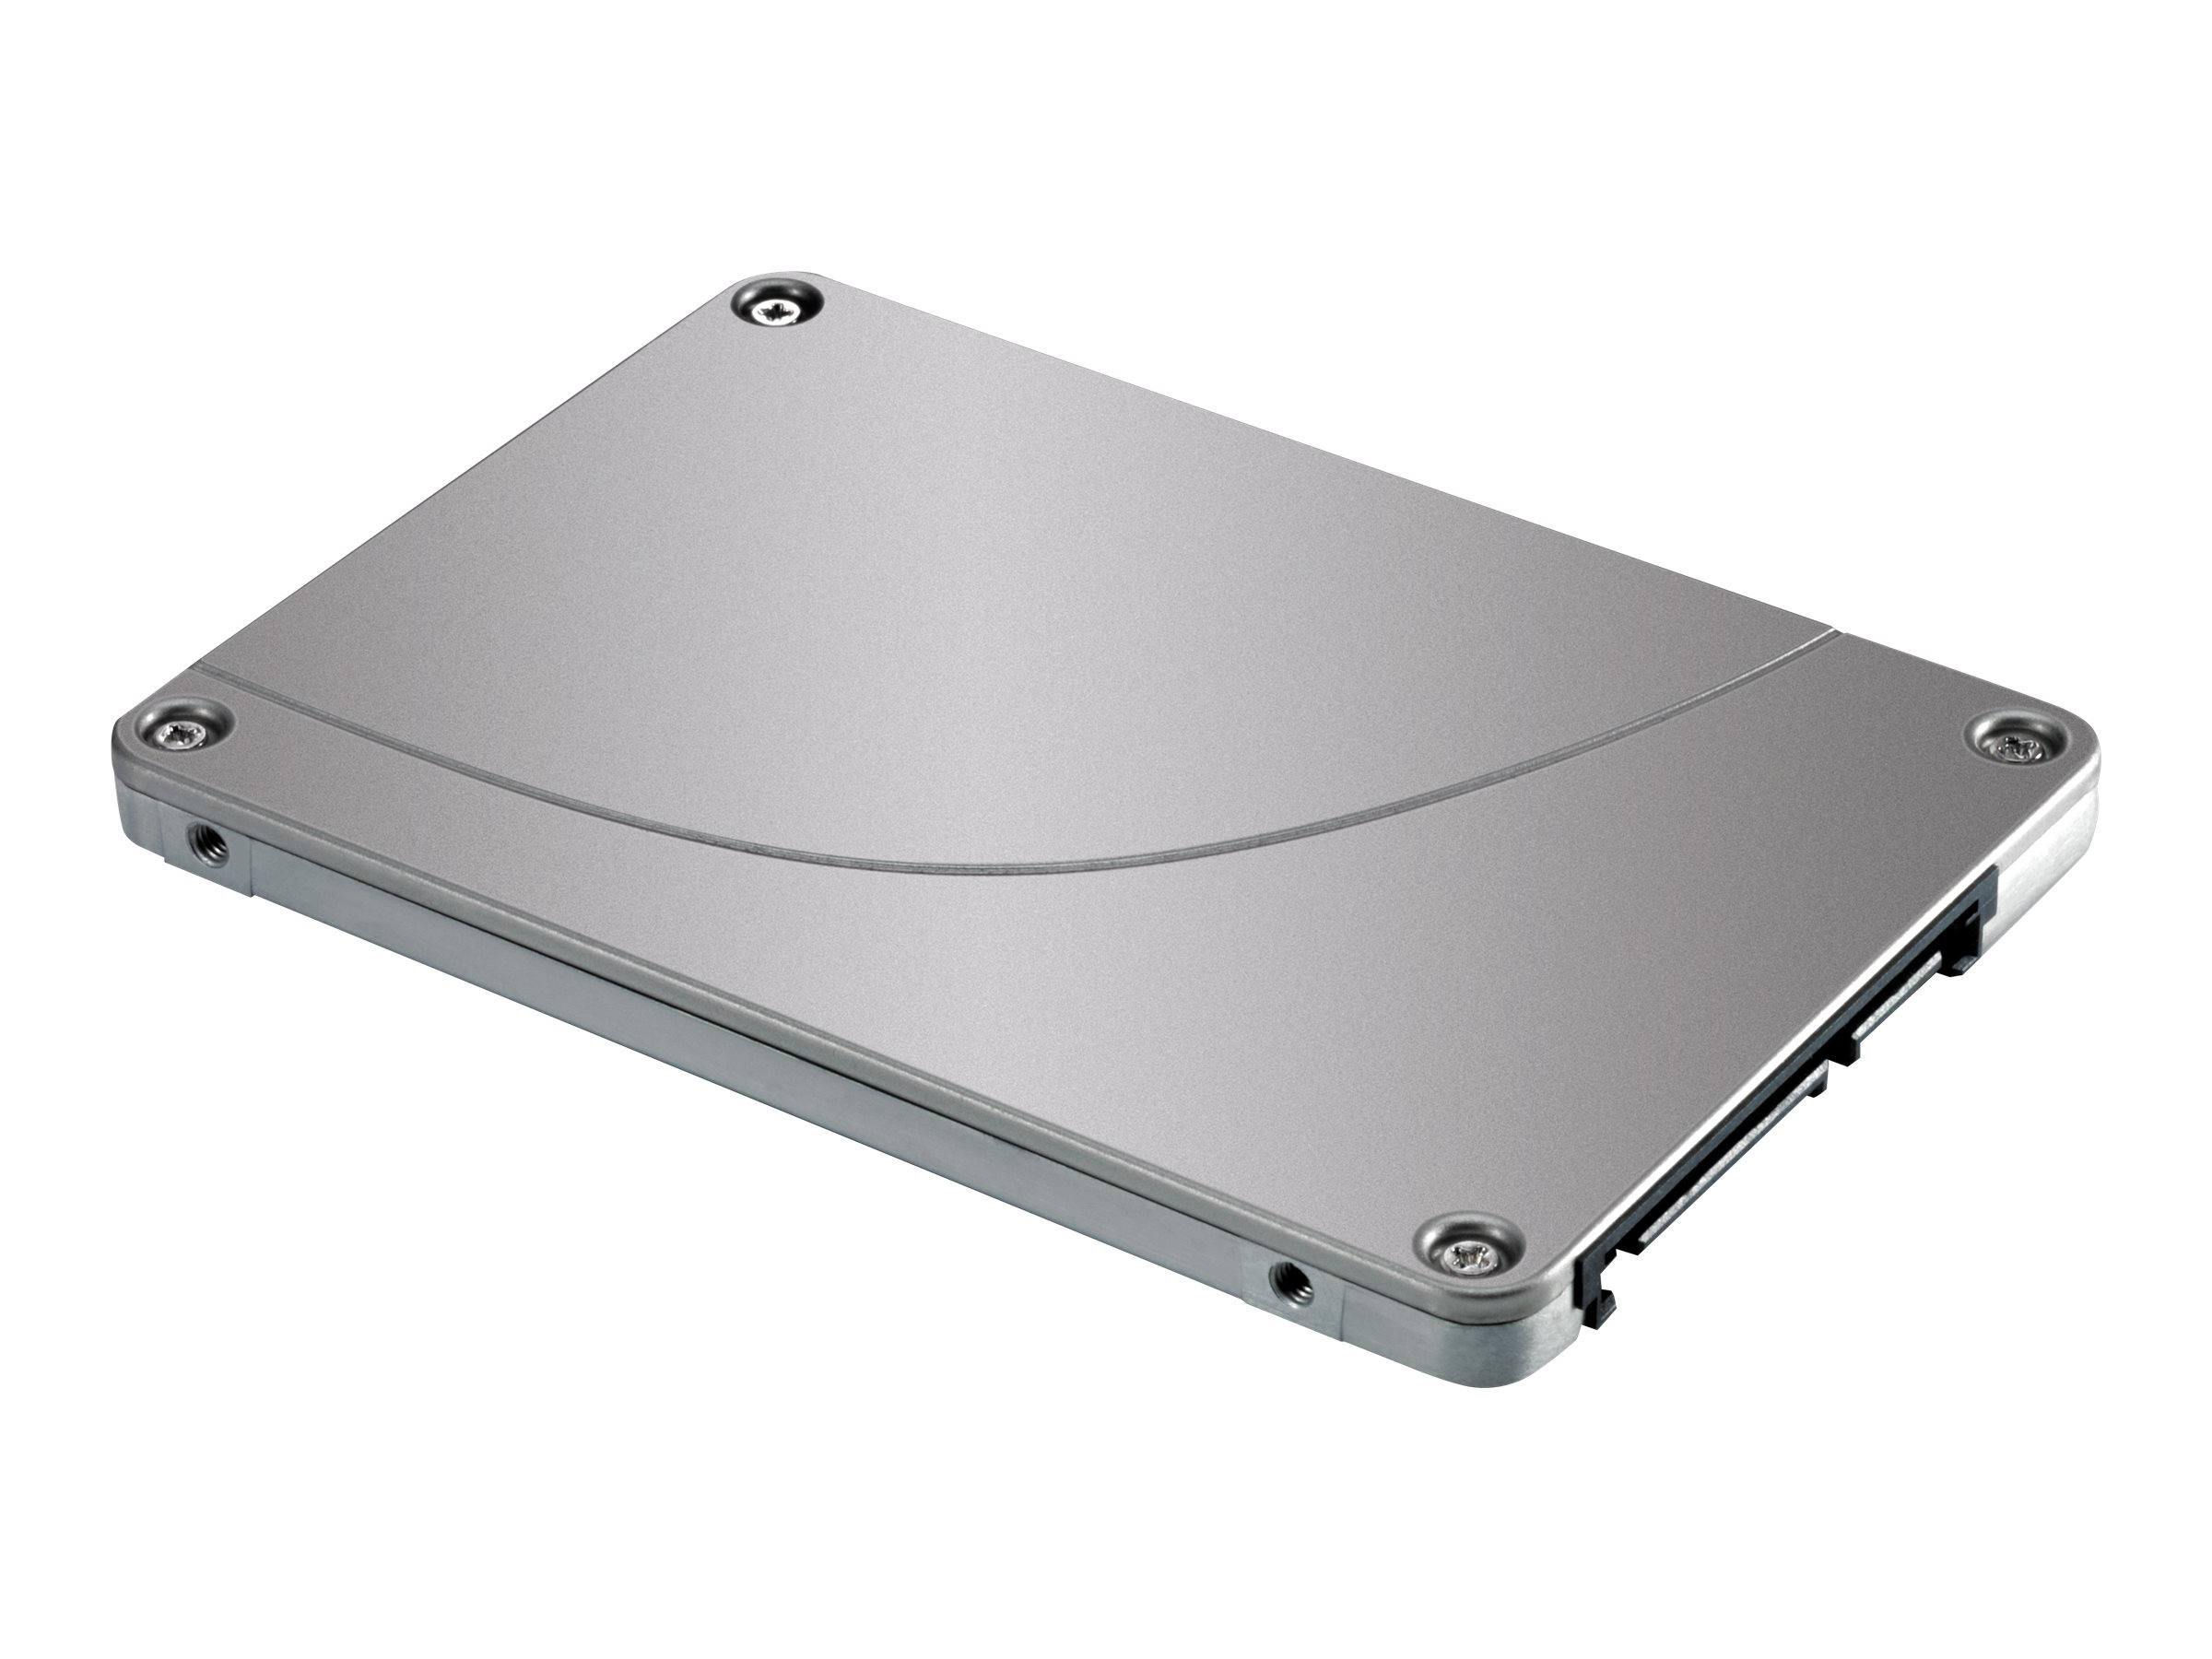 HP - solid state drive - 512 GB - SATA 6Gb/s